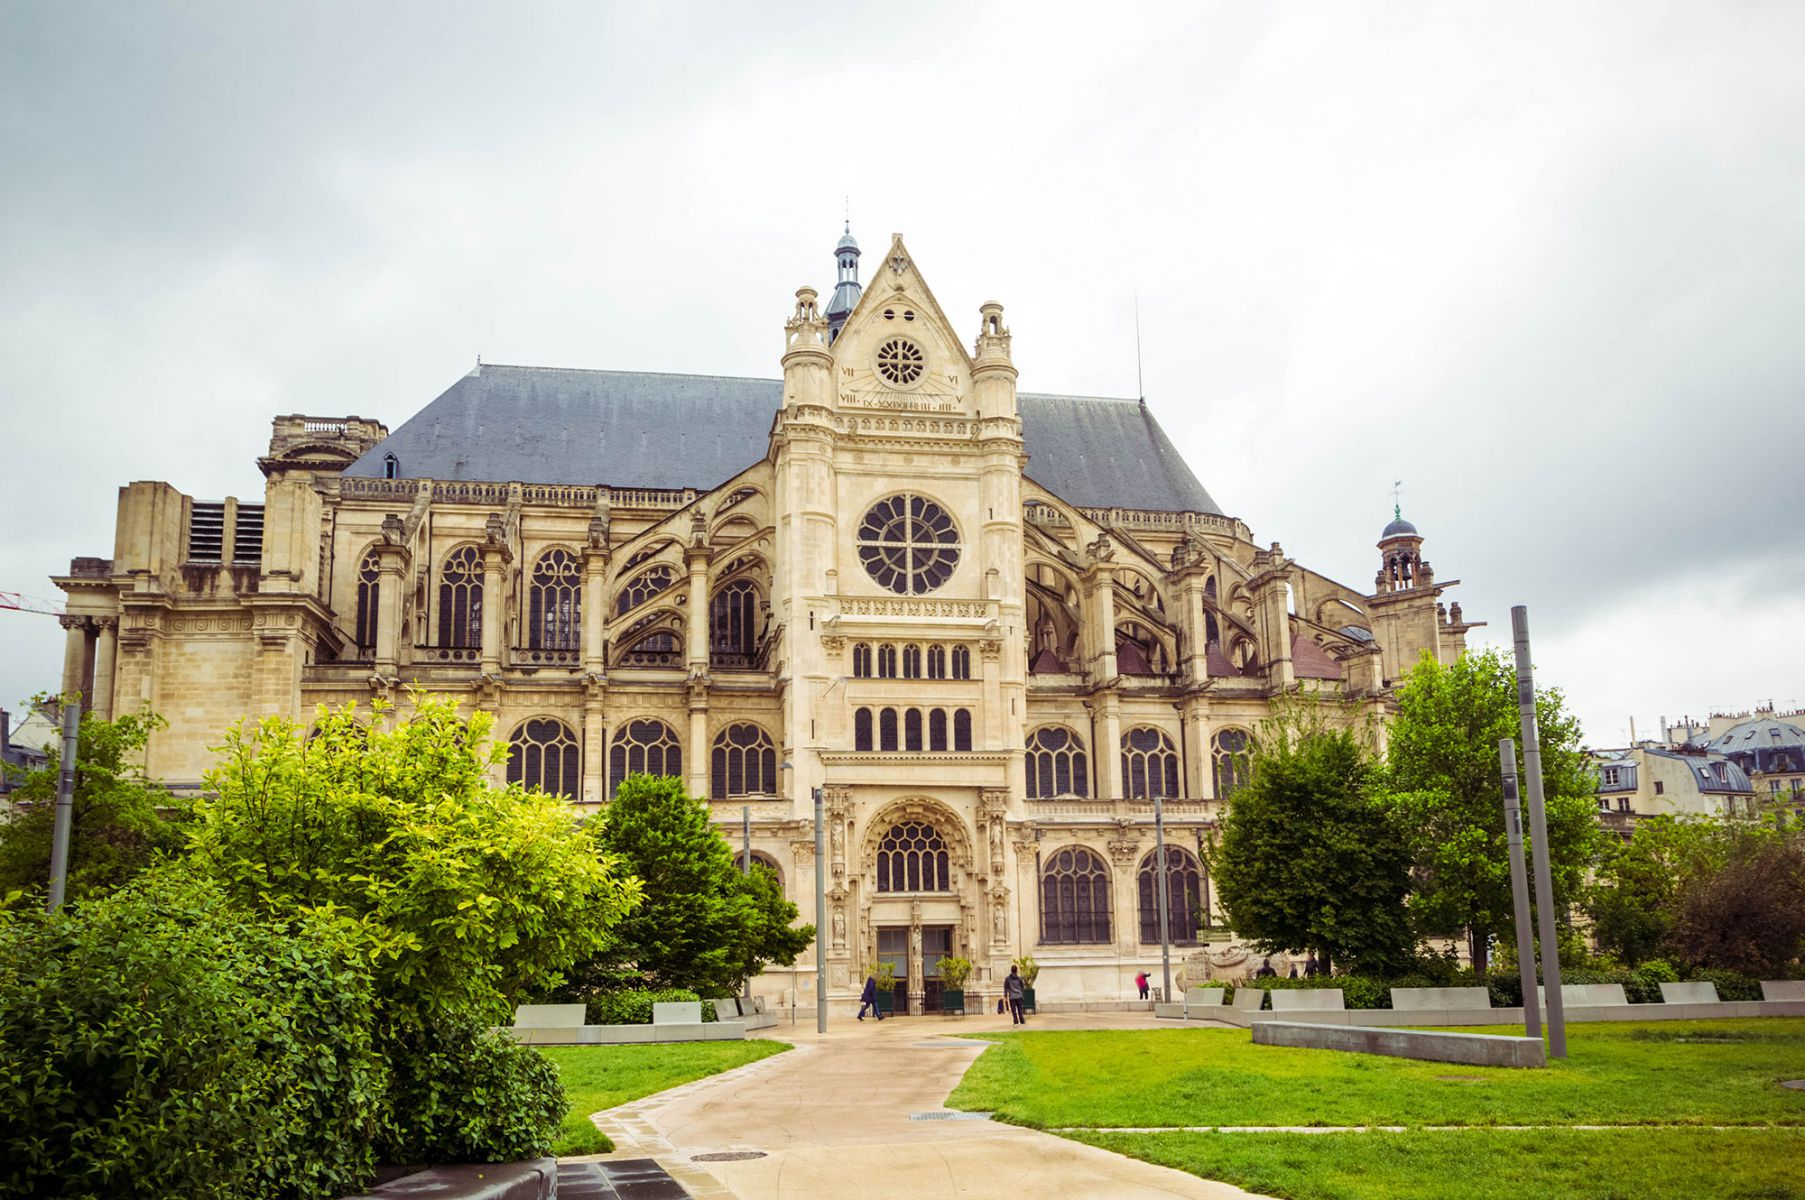 St. Eustache in Parijs